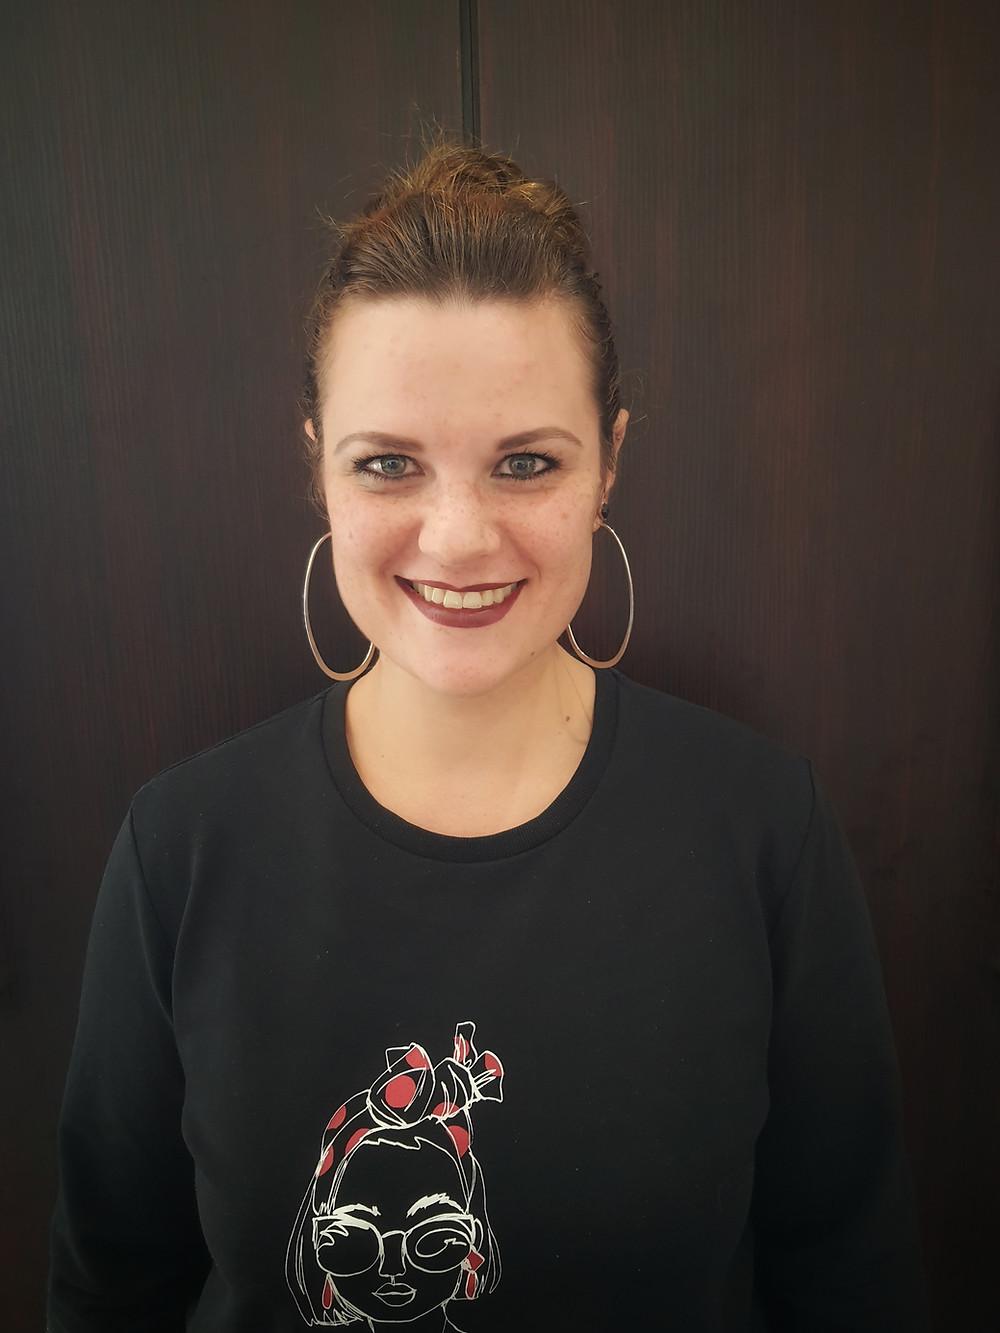 Headshot of Ewie Erasmus, wearing a black crewneck sweatshirt and hoop earrings; she stands against a black background.